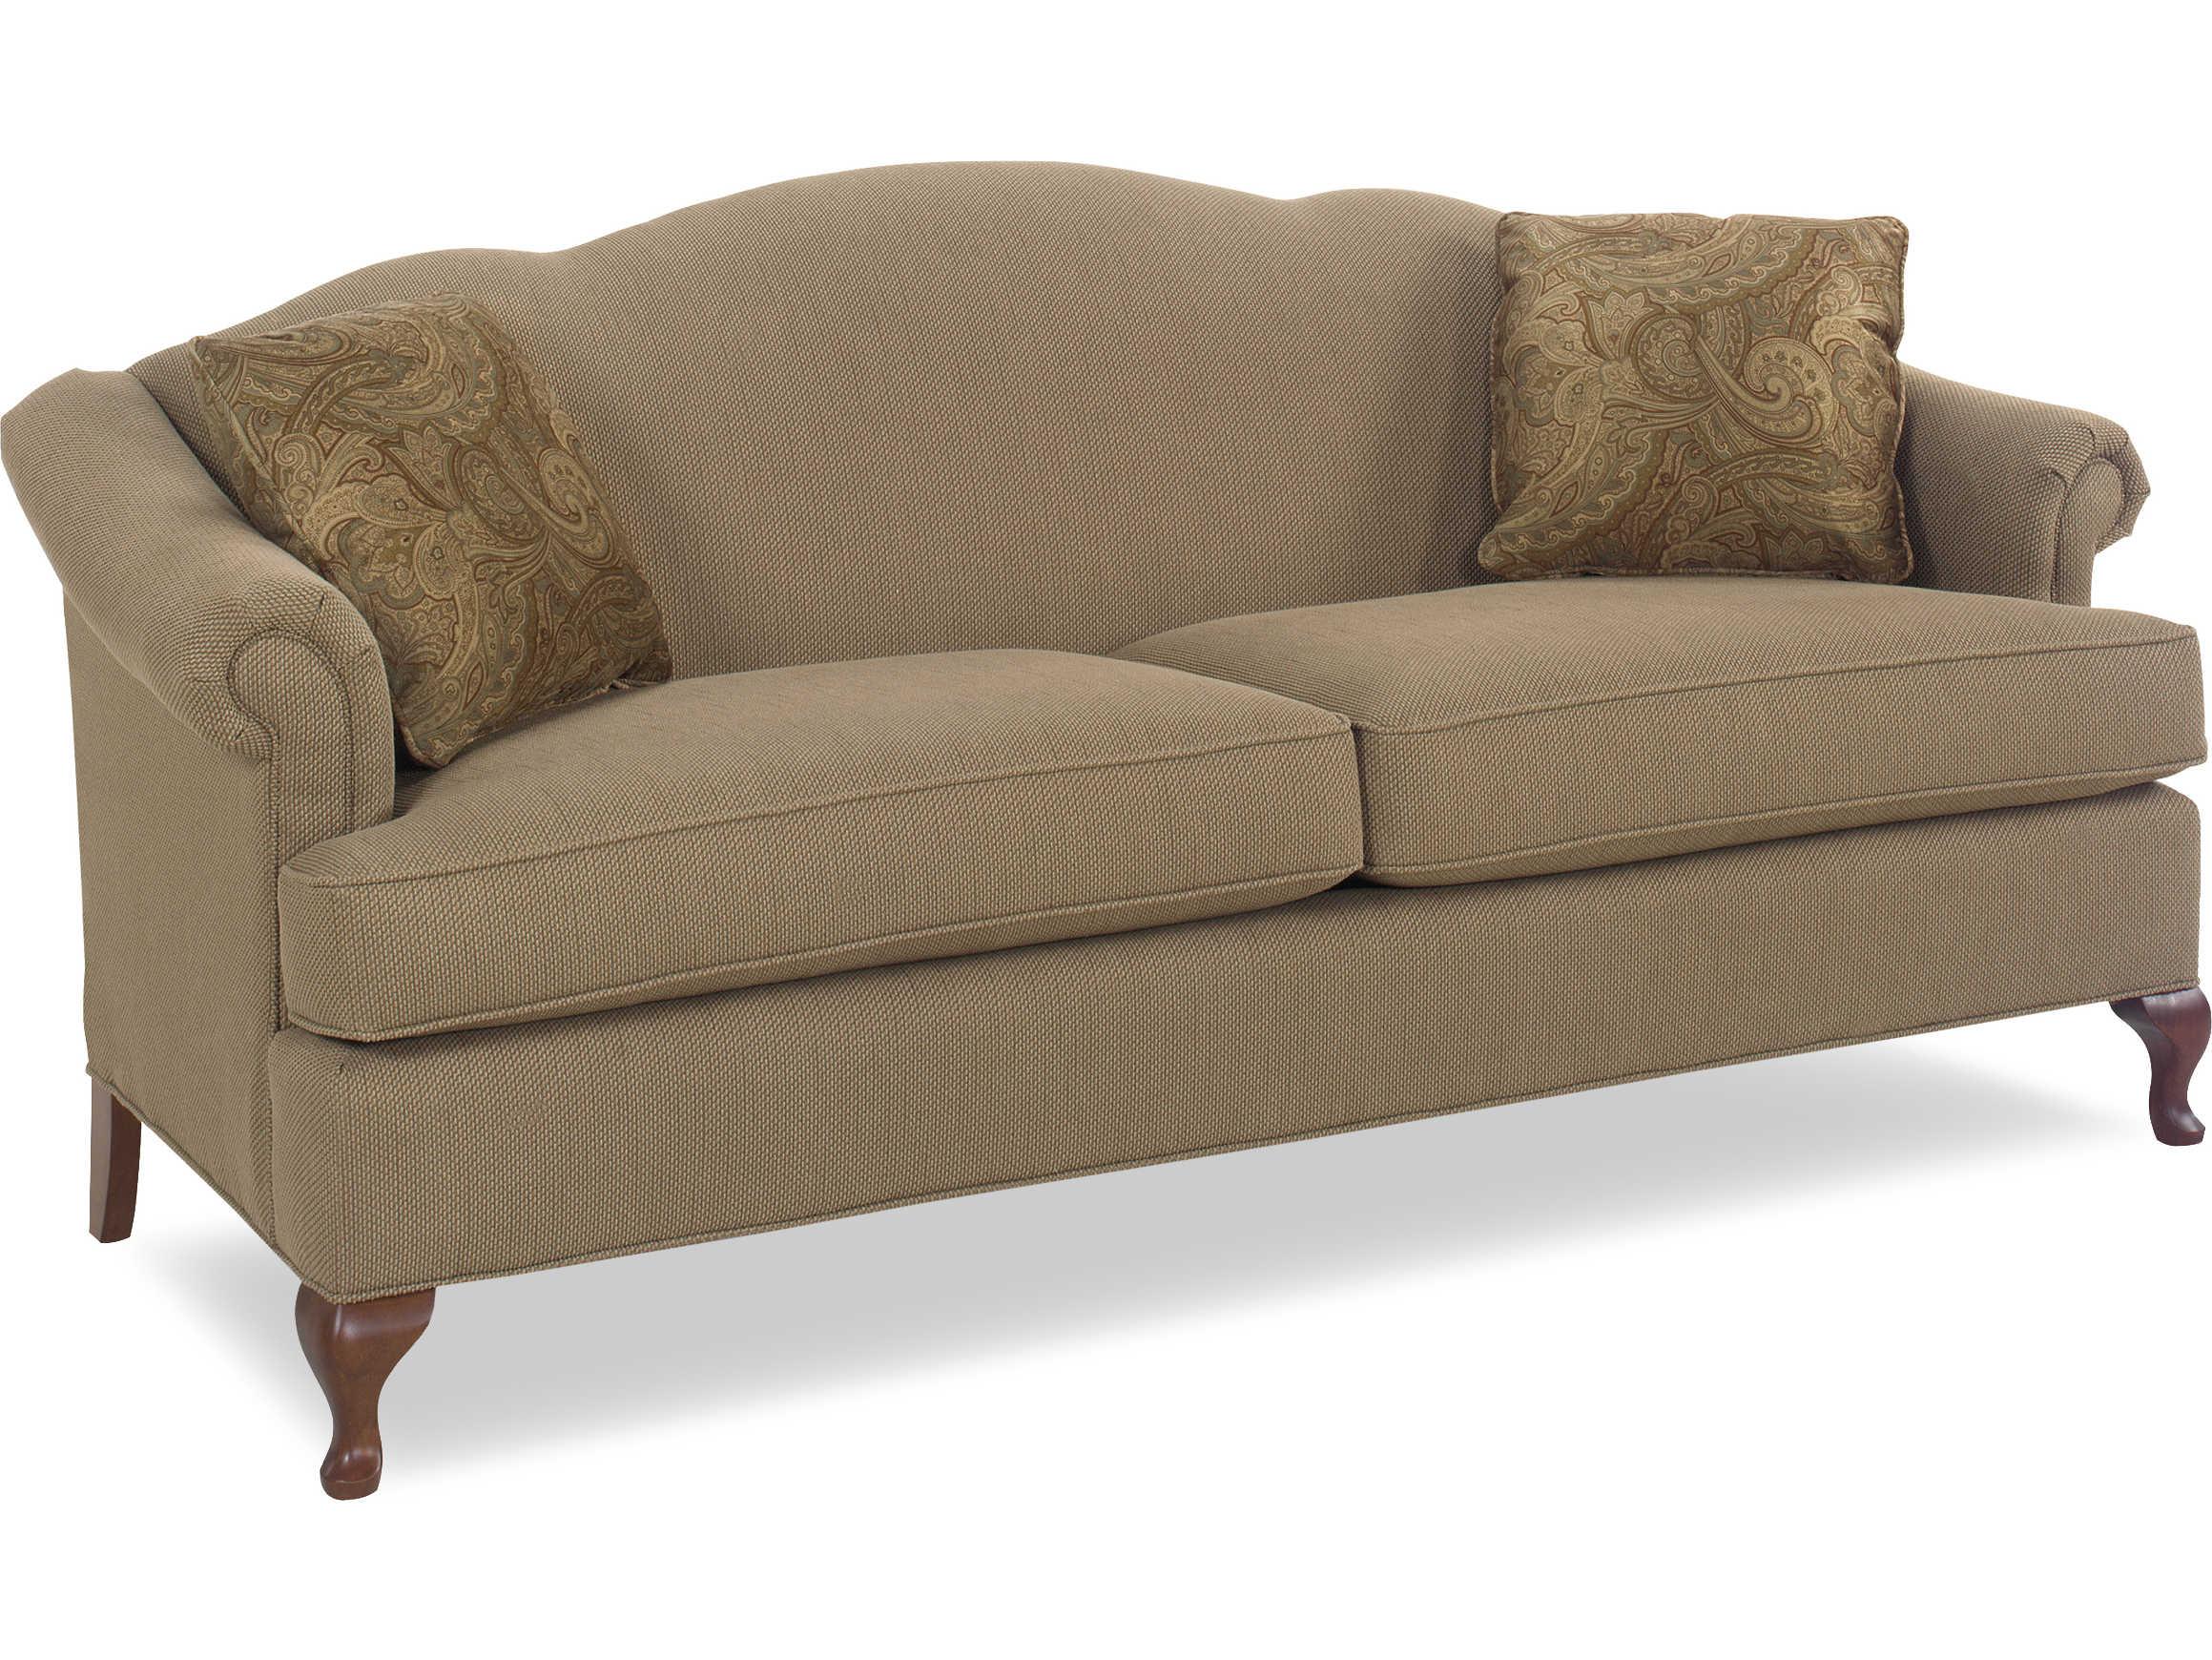 Temple Furniture Yorktown Loveseat Sofa